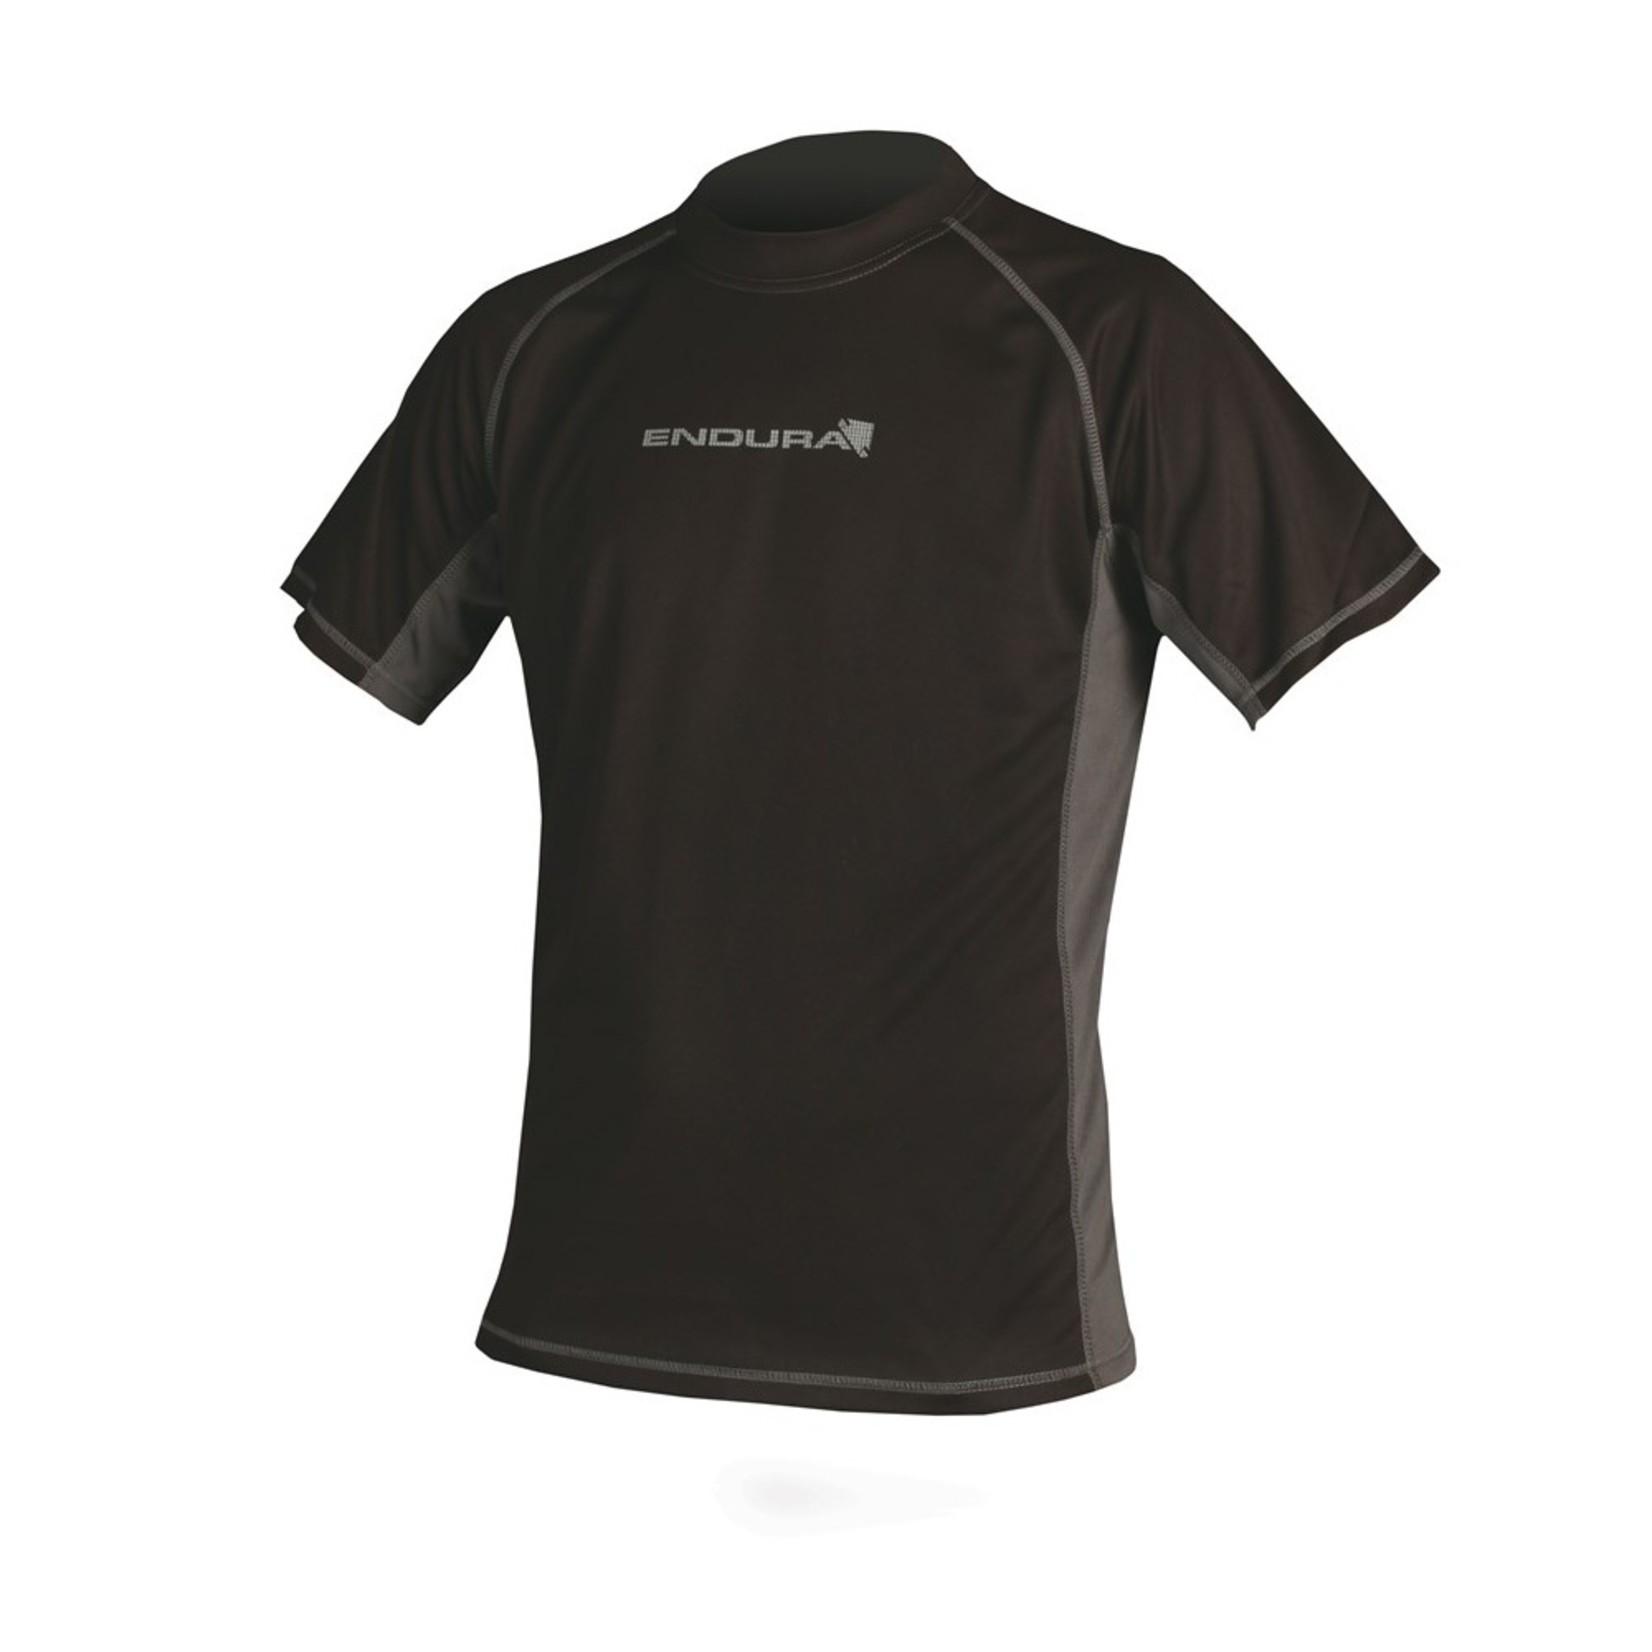 Cairn S/S T-Shirt Black Grey S